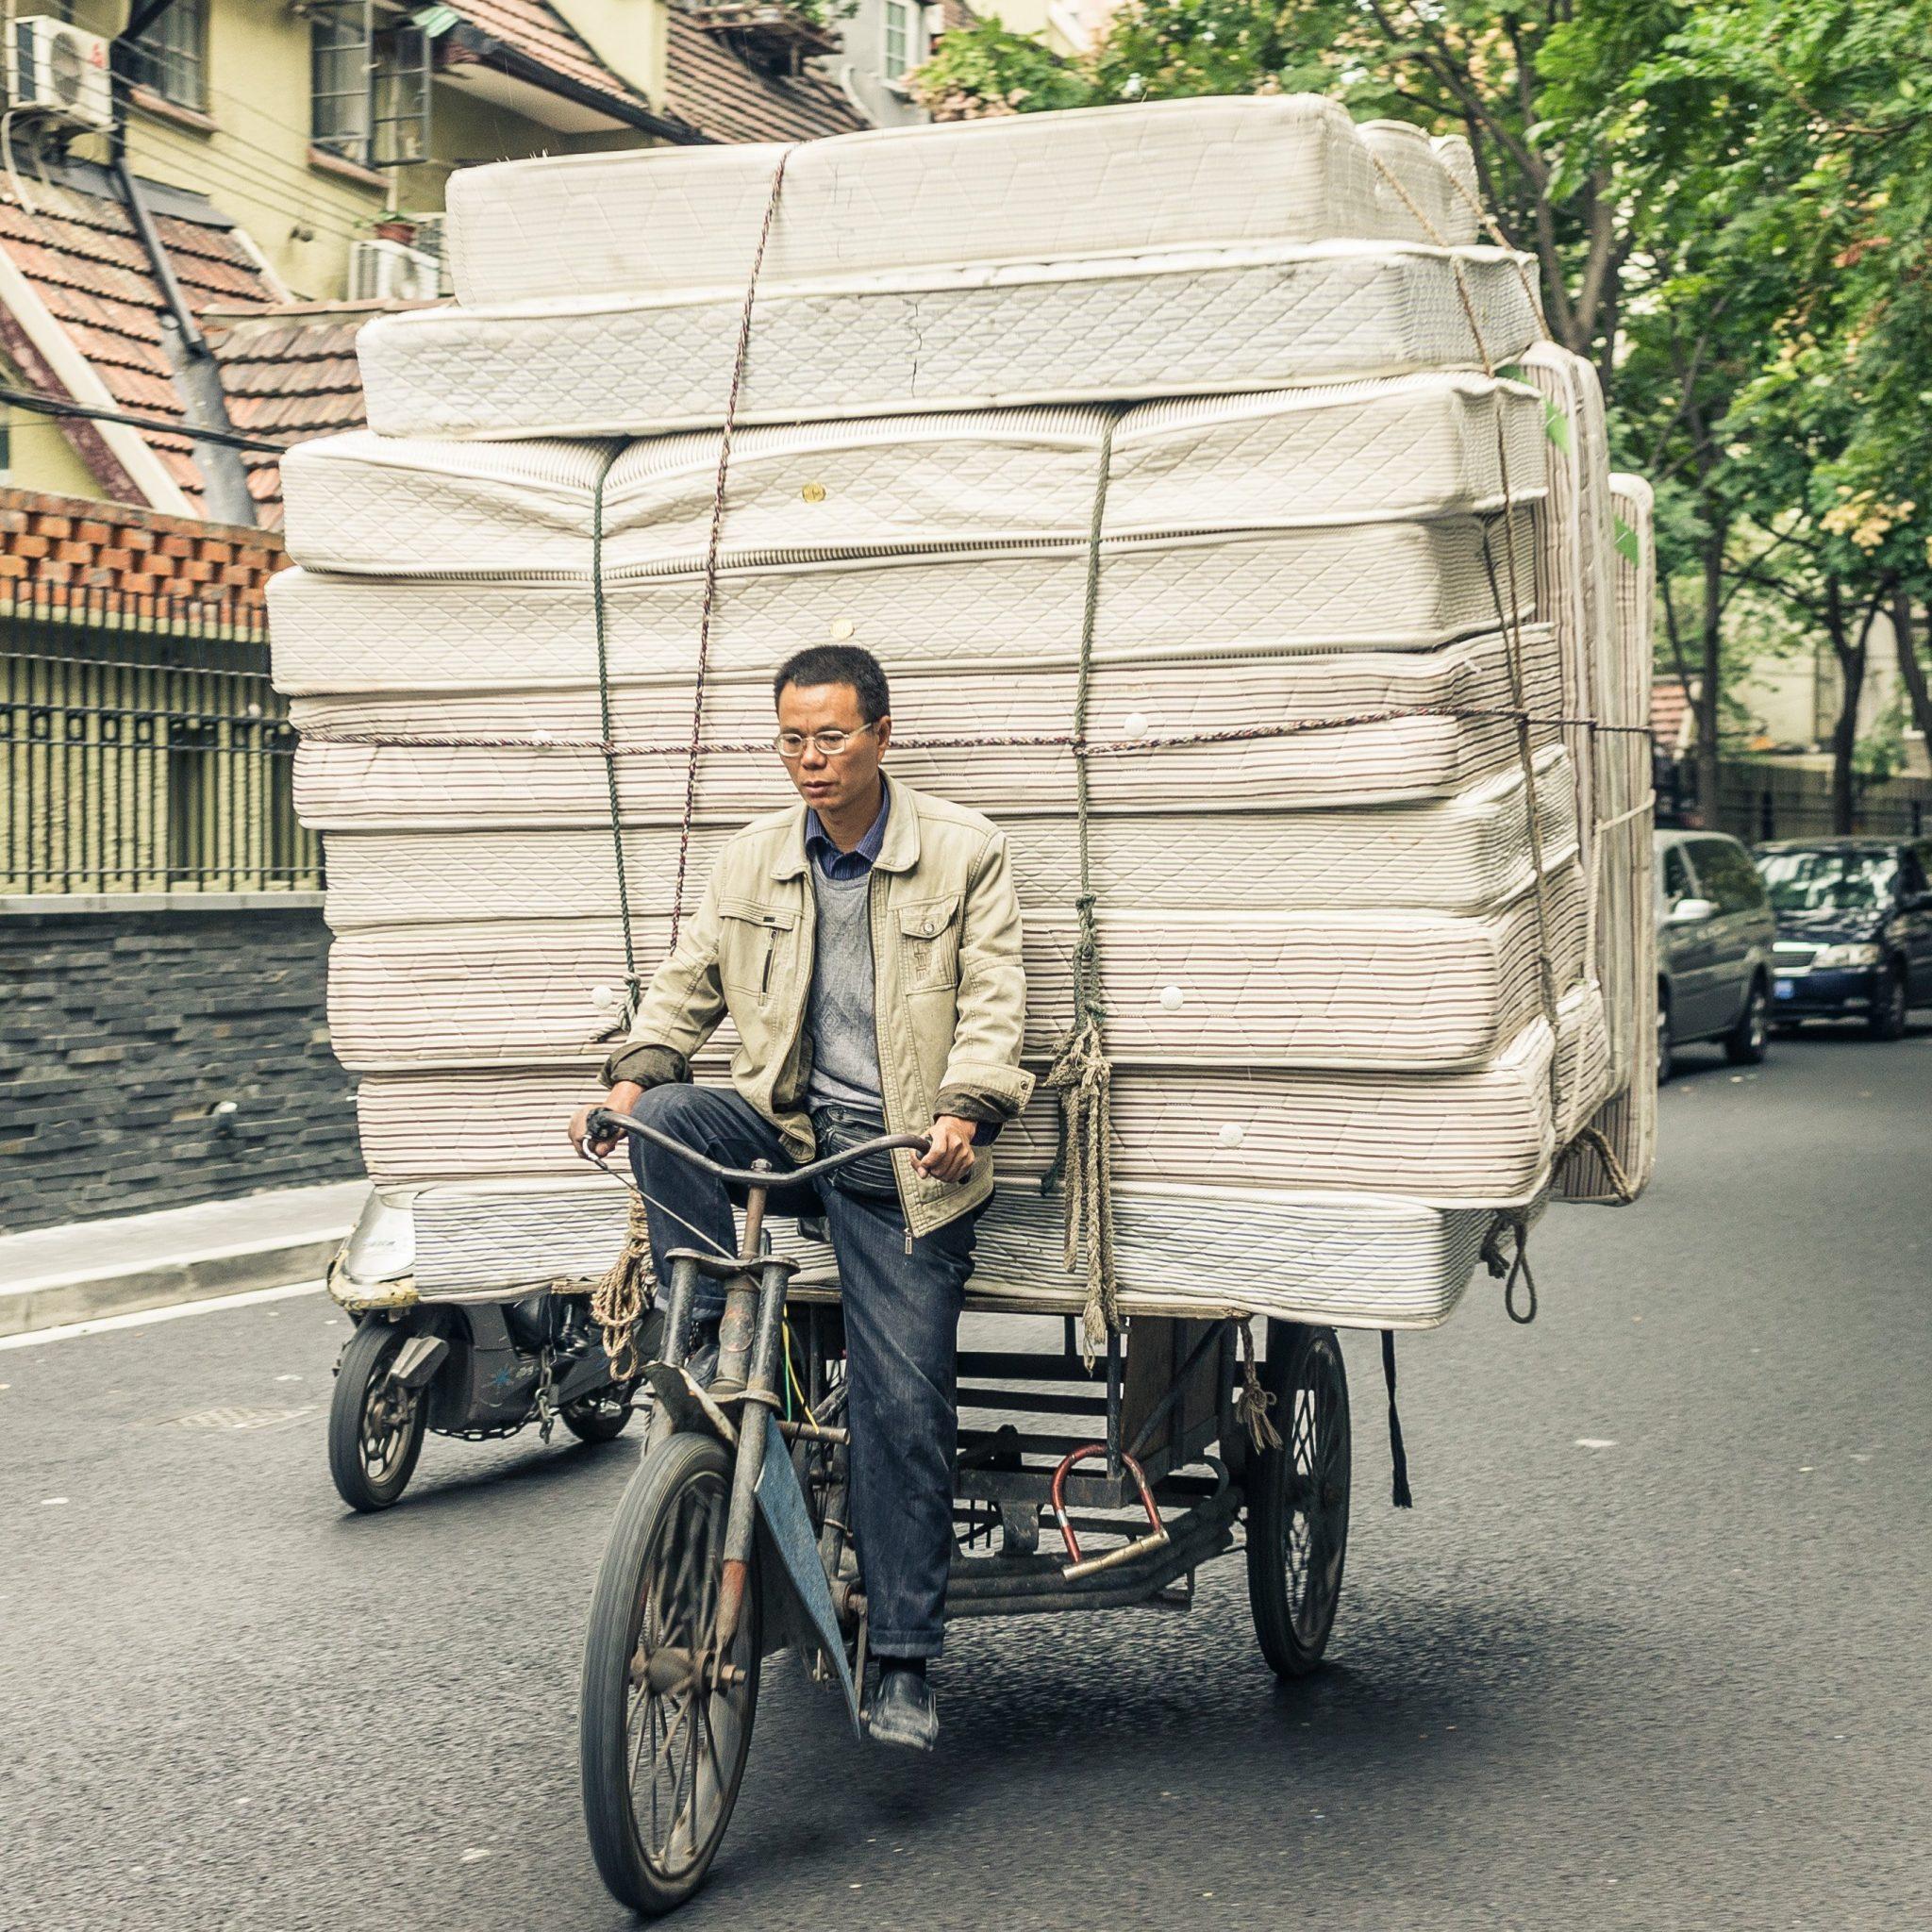 Install Rear Bike Rack Without Braze Ons